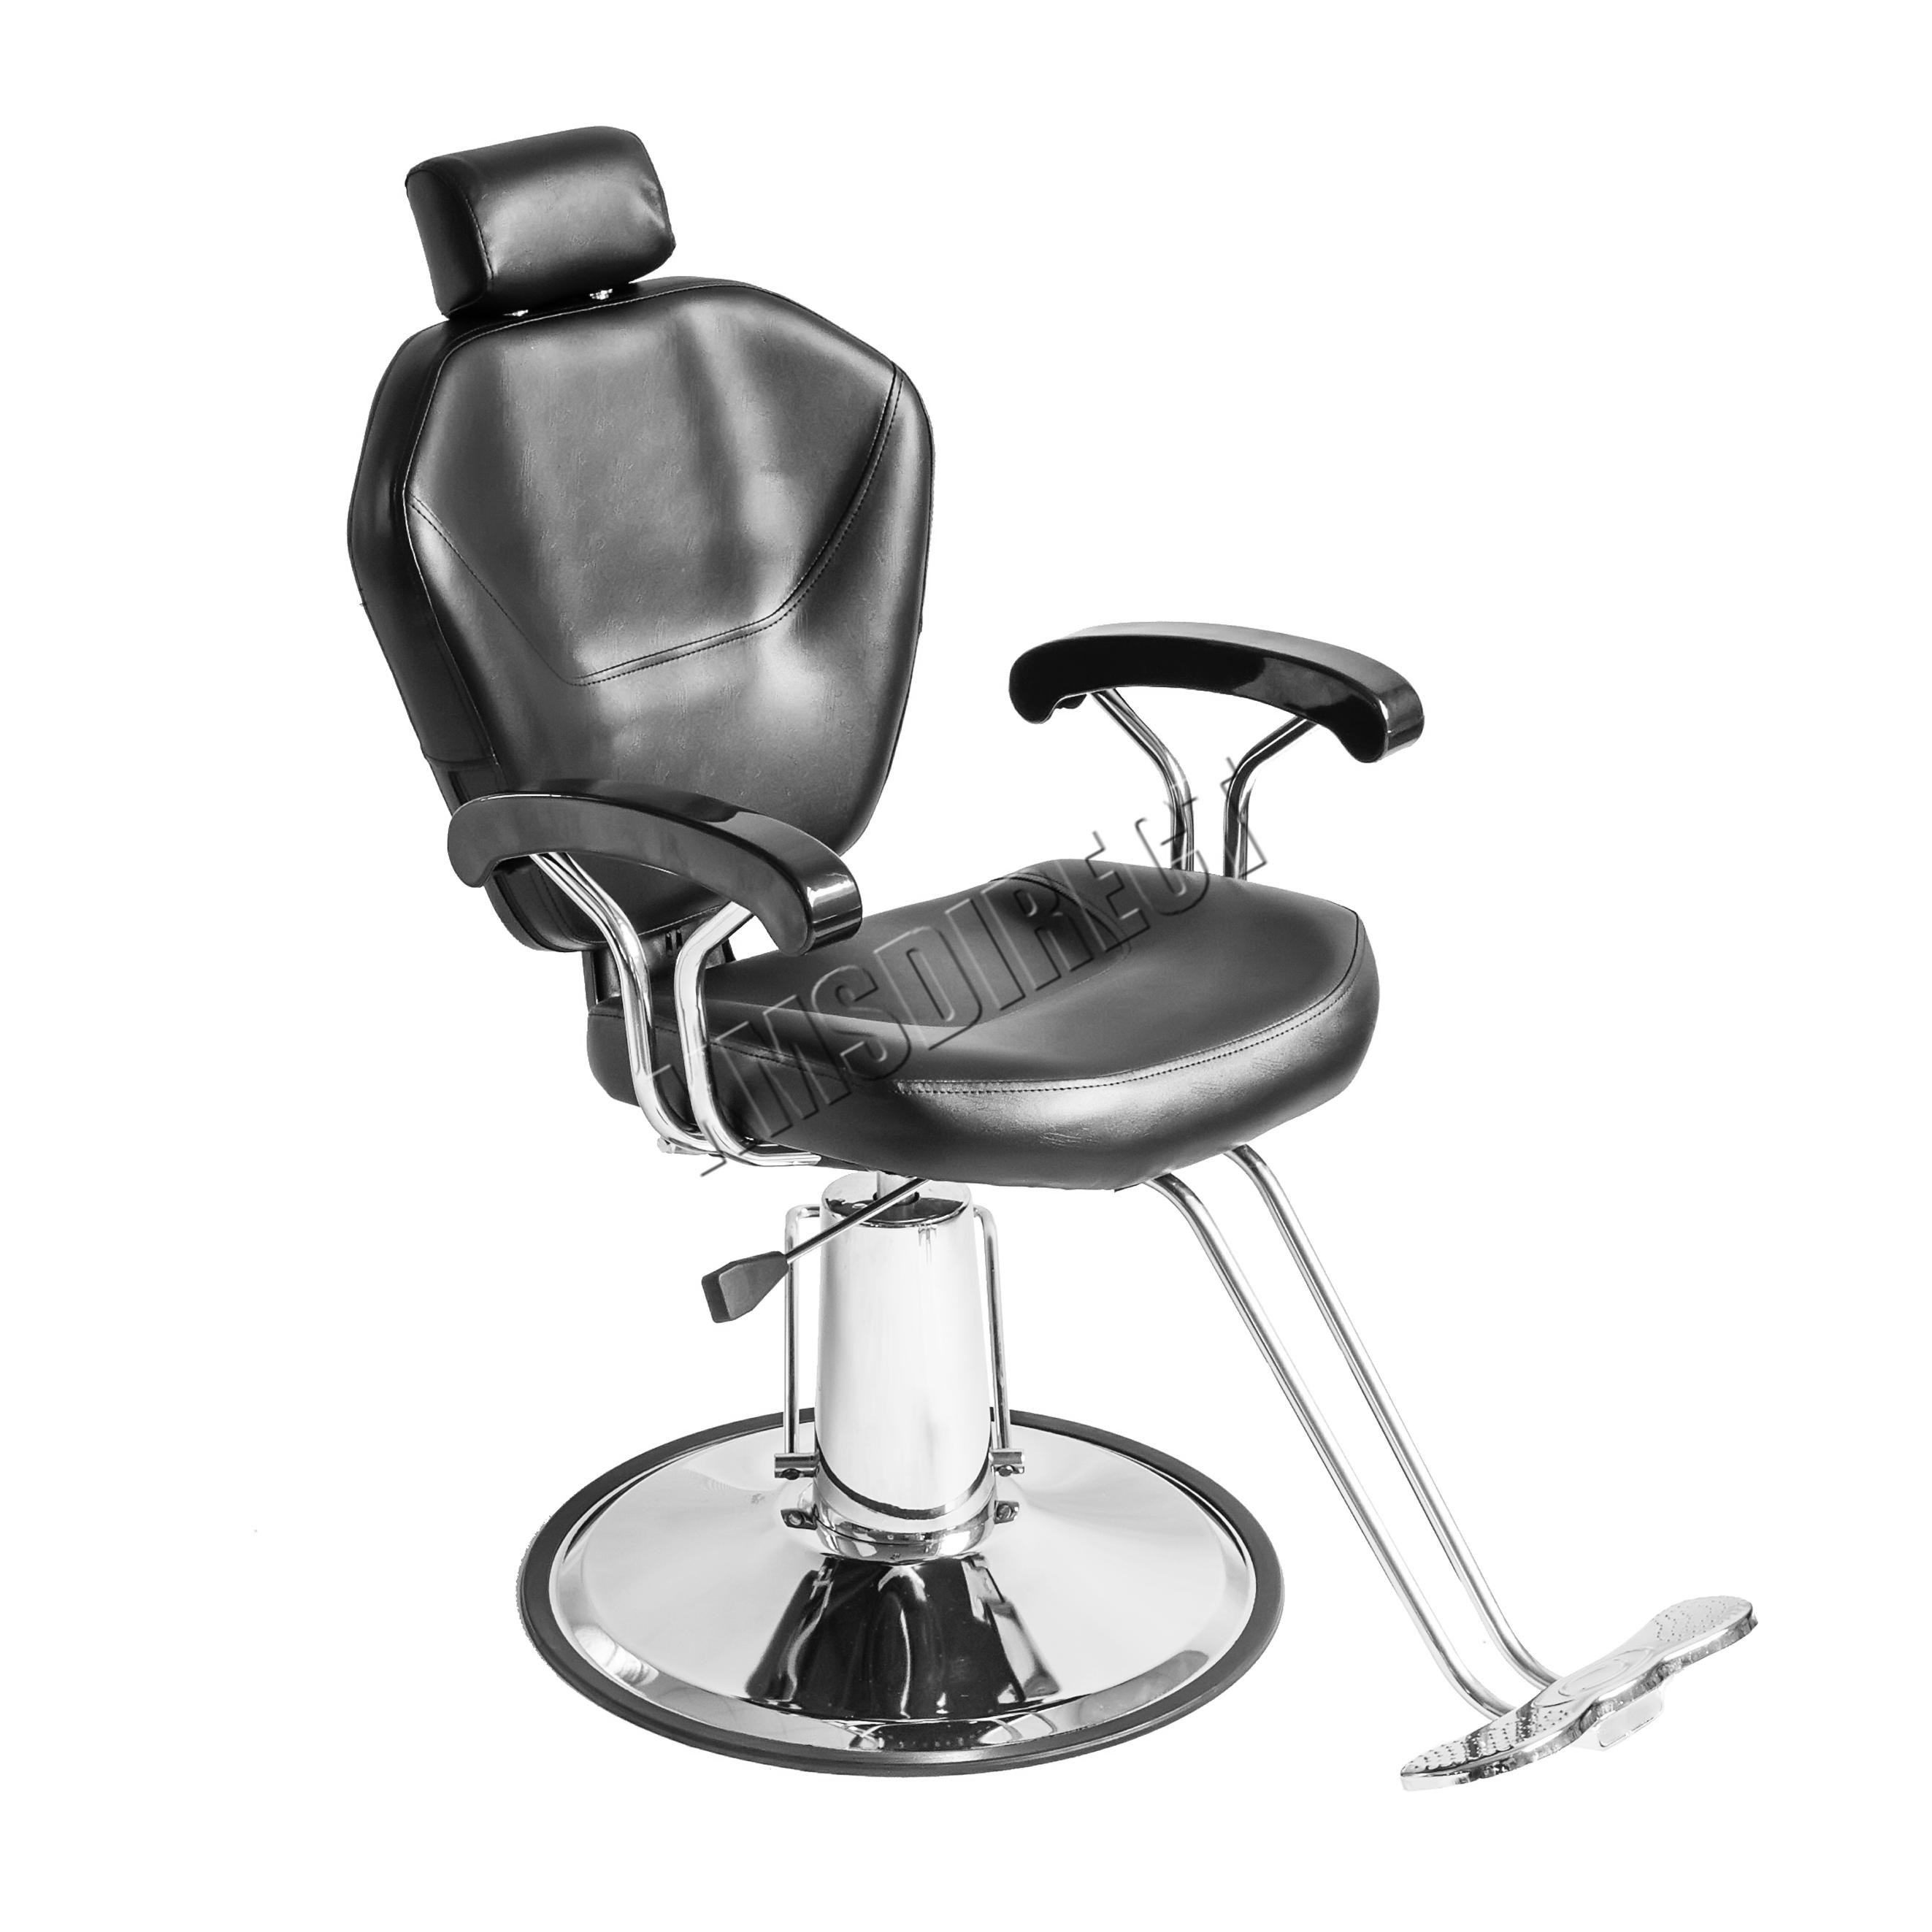 foxhunter salon barbier hydraulique fauteuil inclinable coiffure beaut tatouage. Black Bedroom Furniture Sets. Home Design Ideas